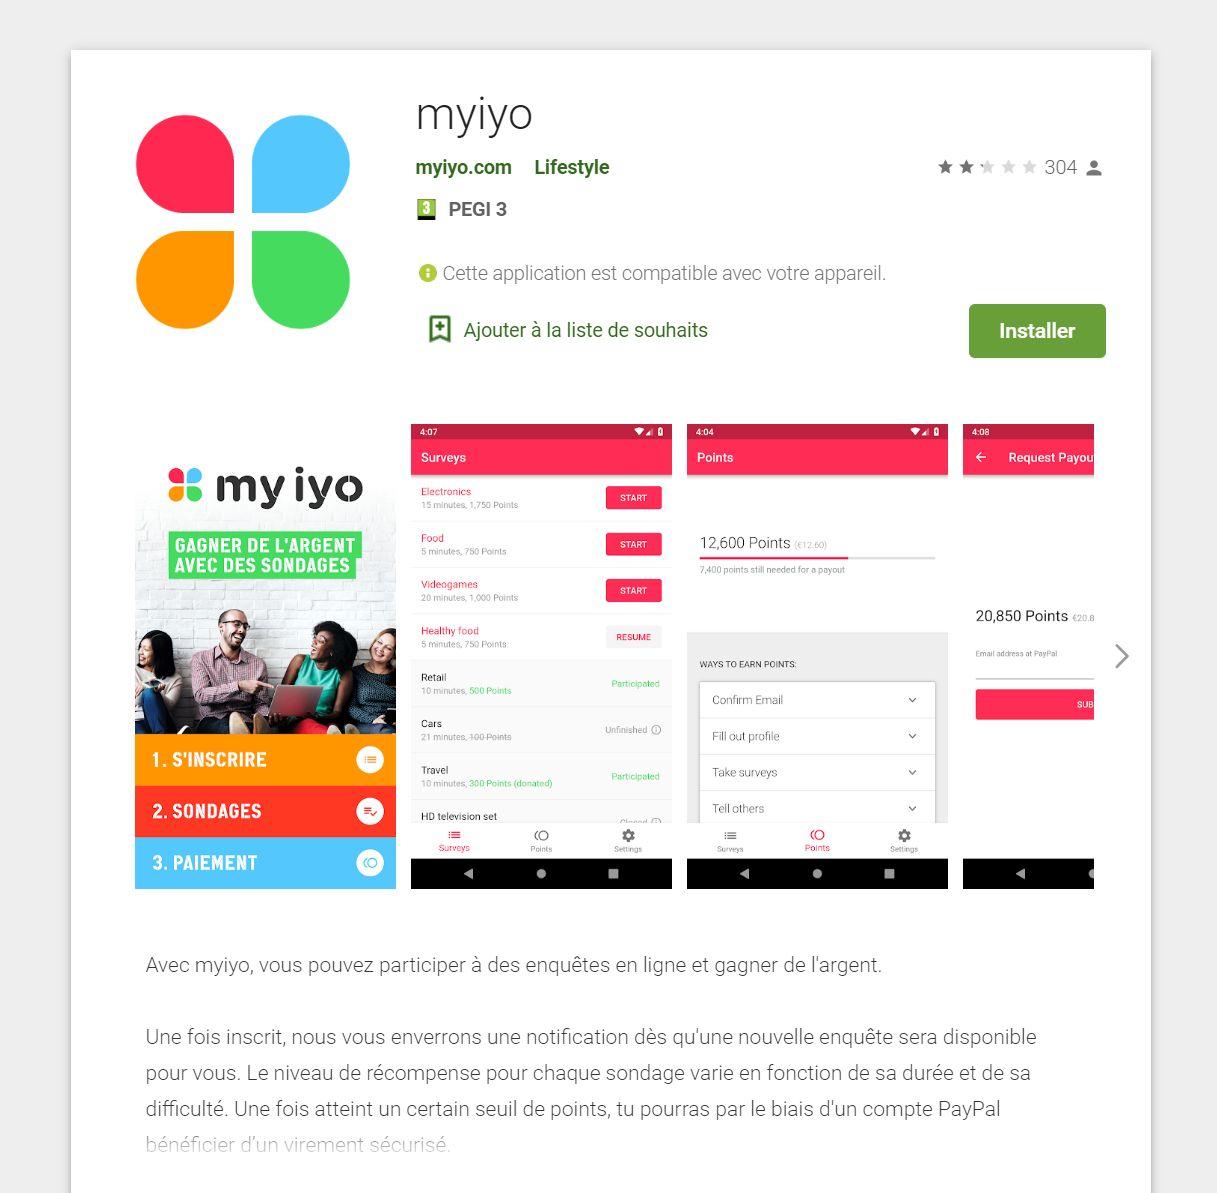 Avis sur l'application myiyo